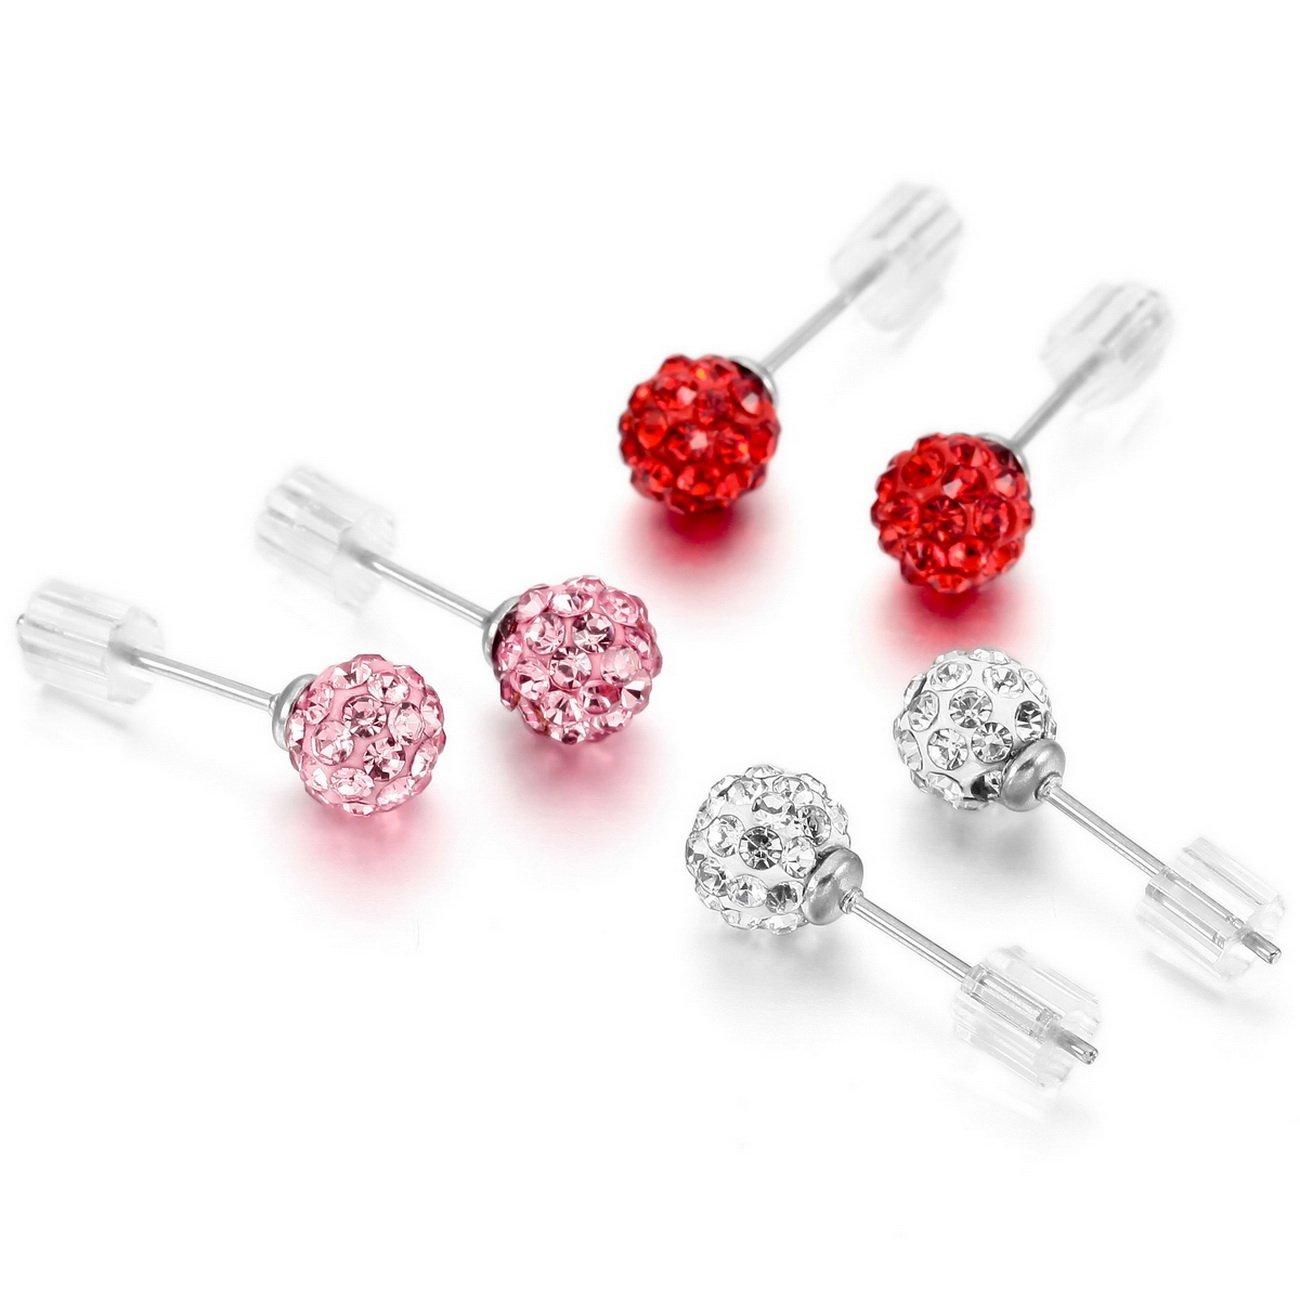 MOWOM Multicolor 6mm 8mm Stainless Steel Stud Earrings Ball Set ca5060041